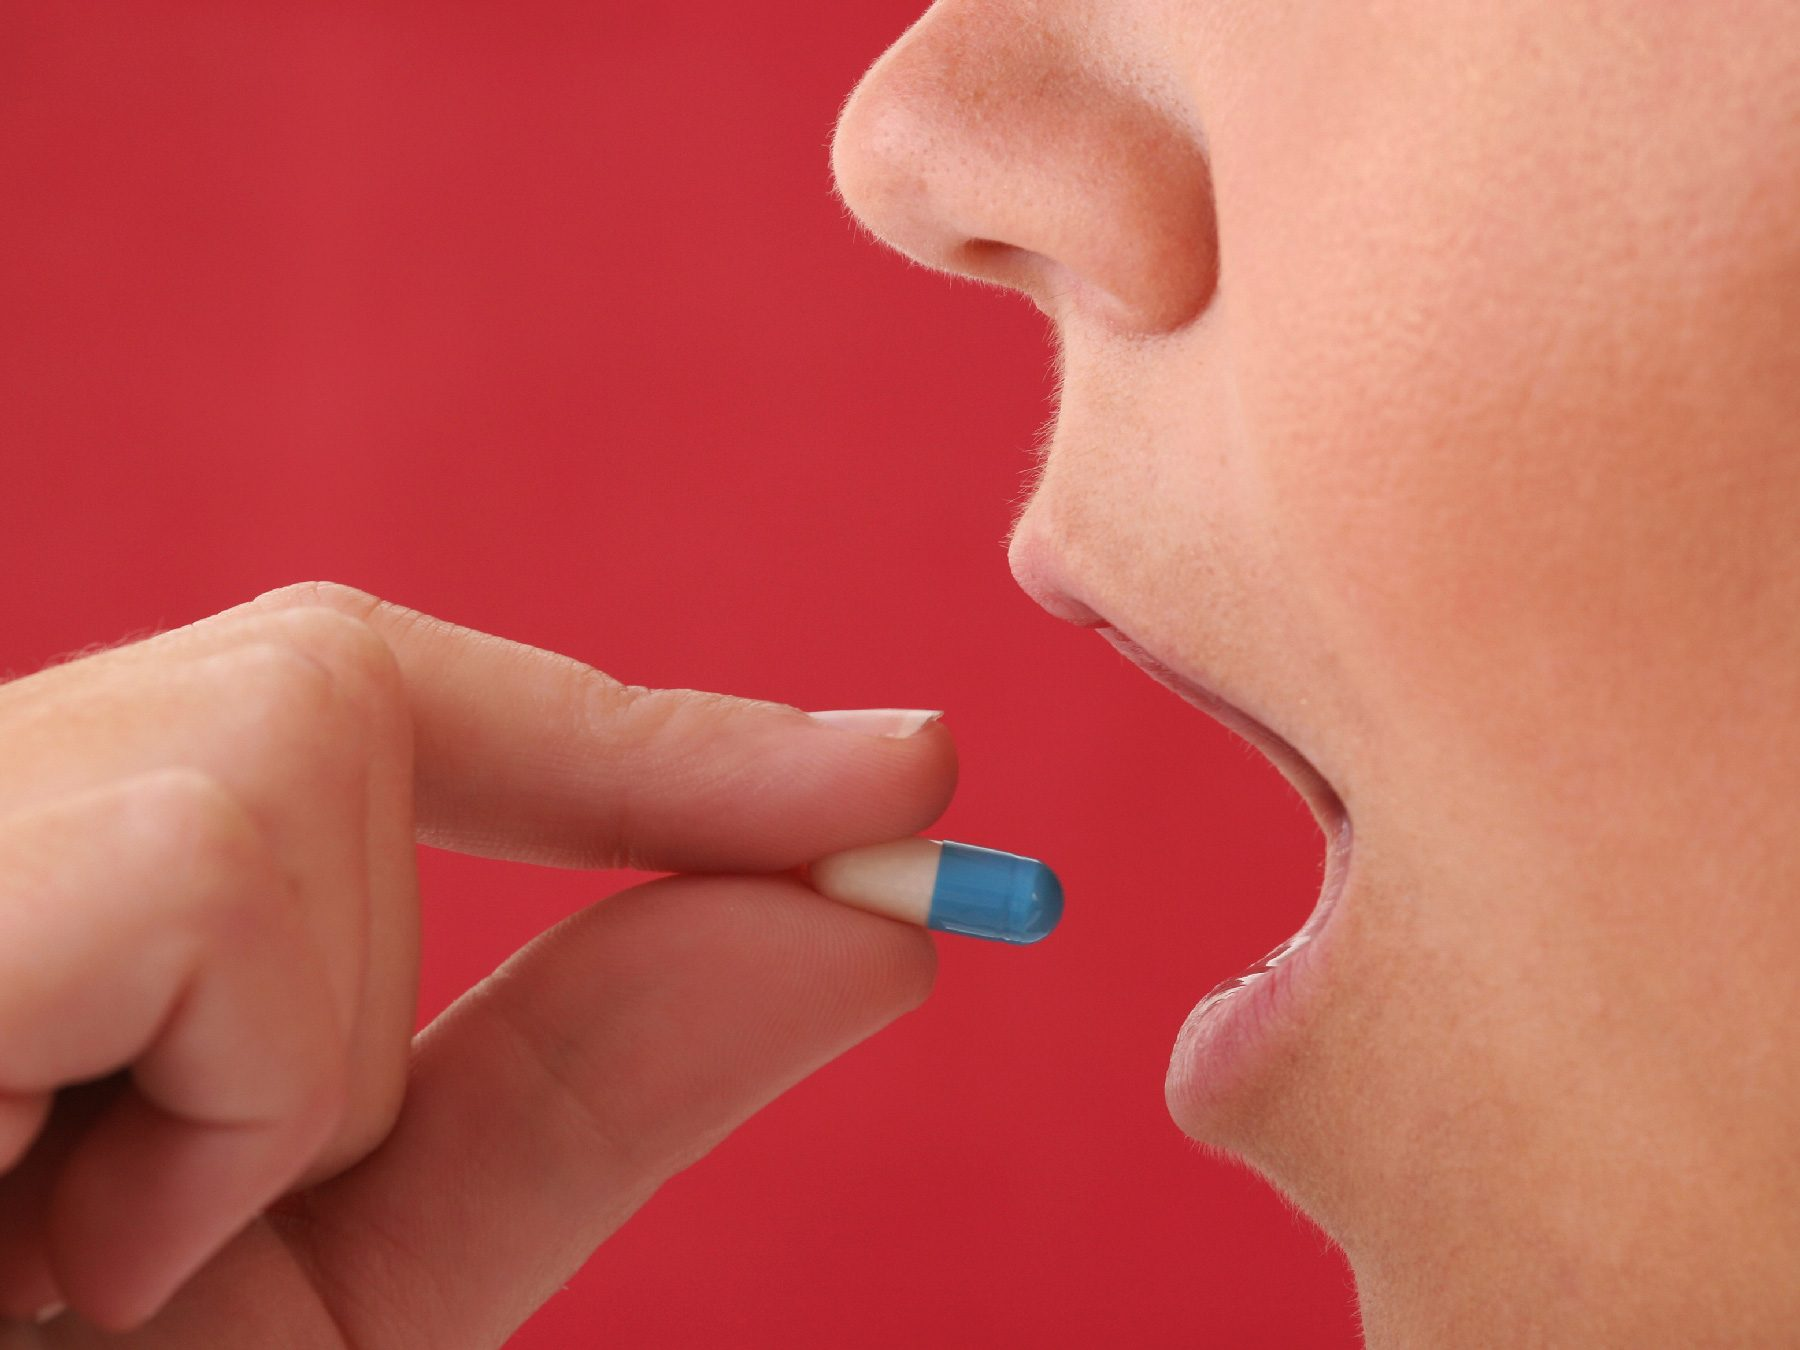 Антибиотики при тонзиллите в домашних условиях